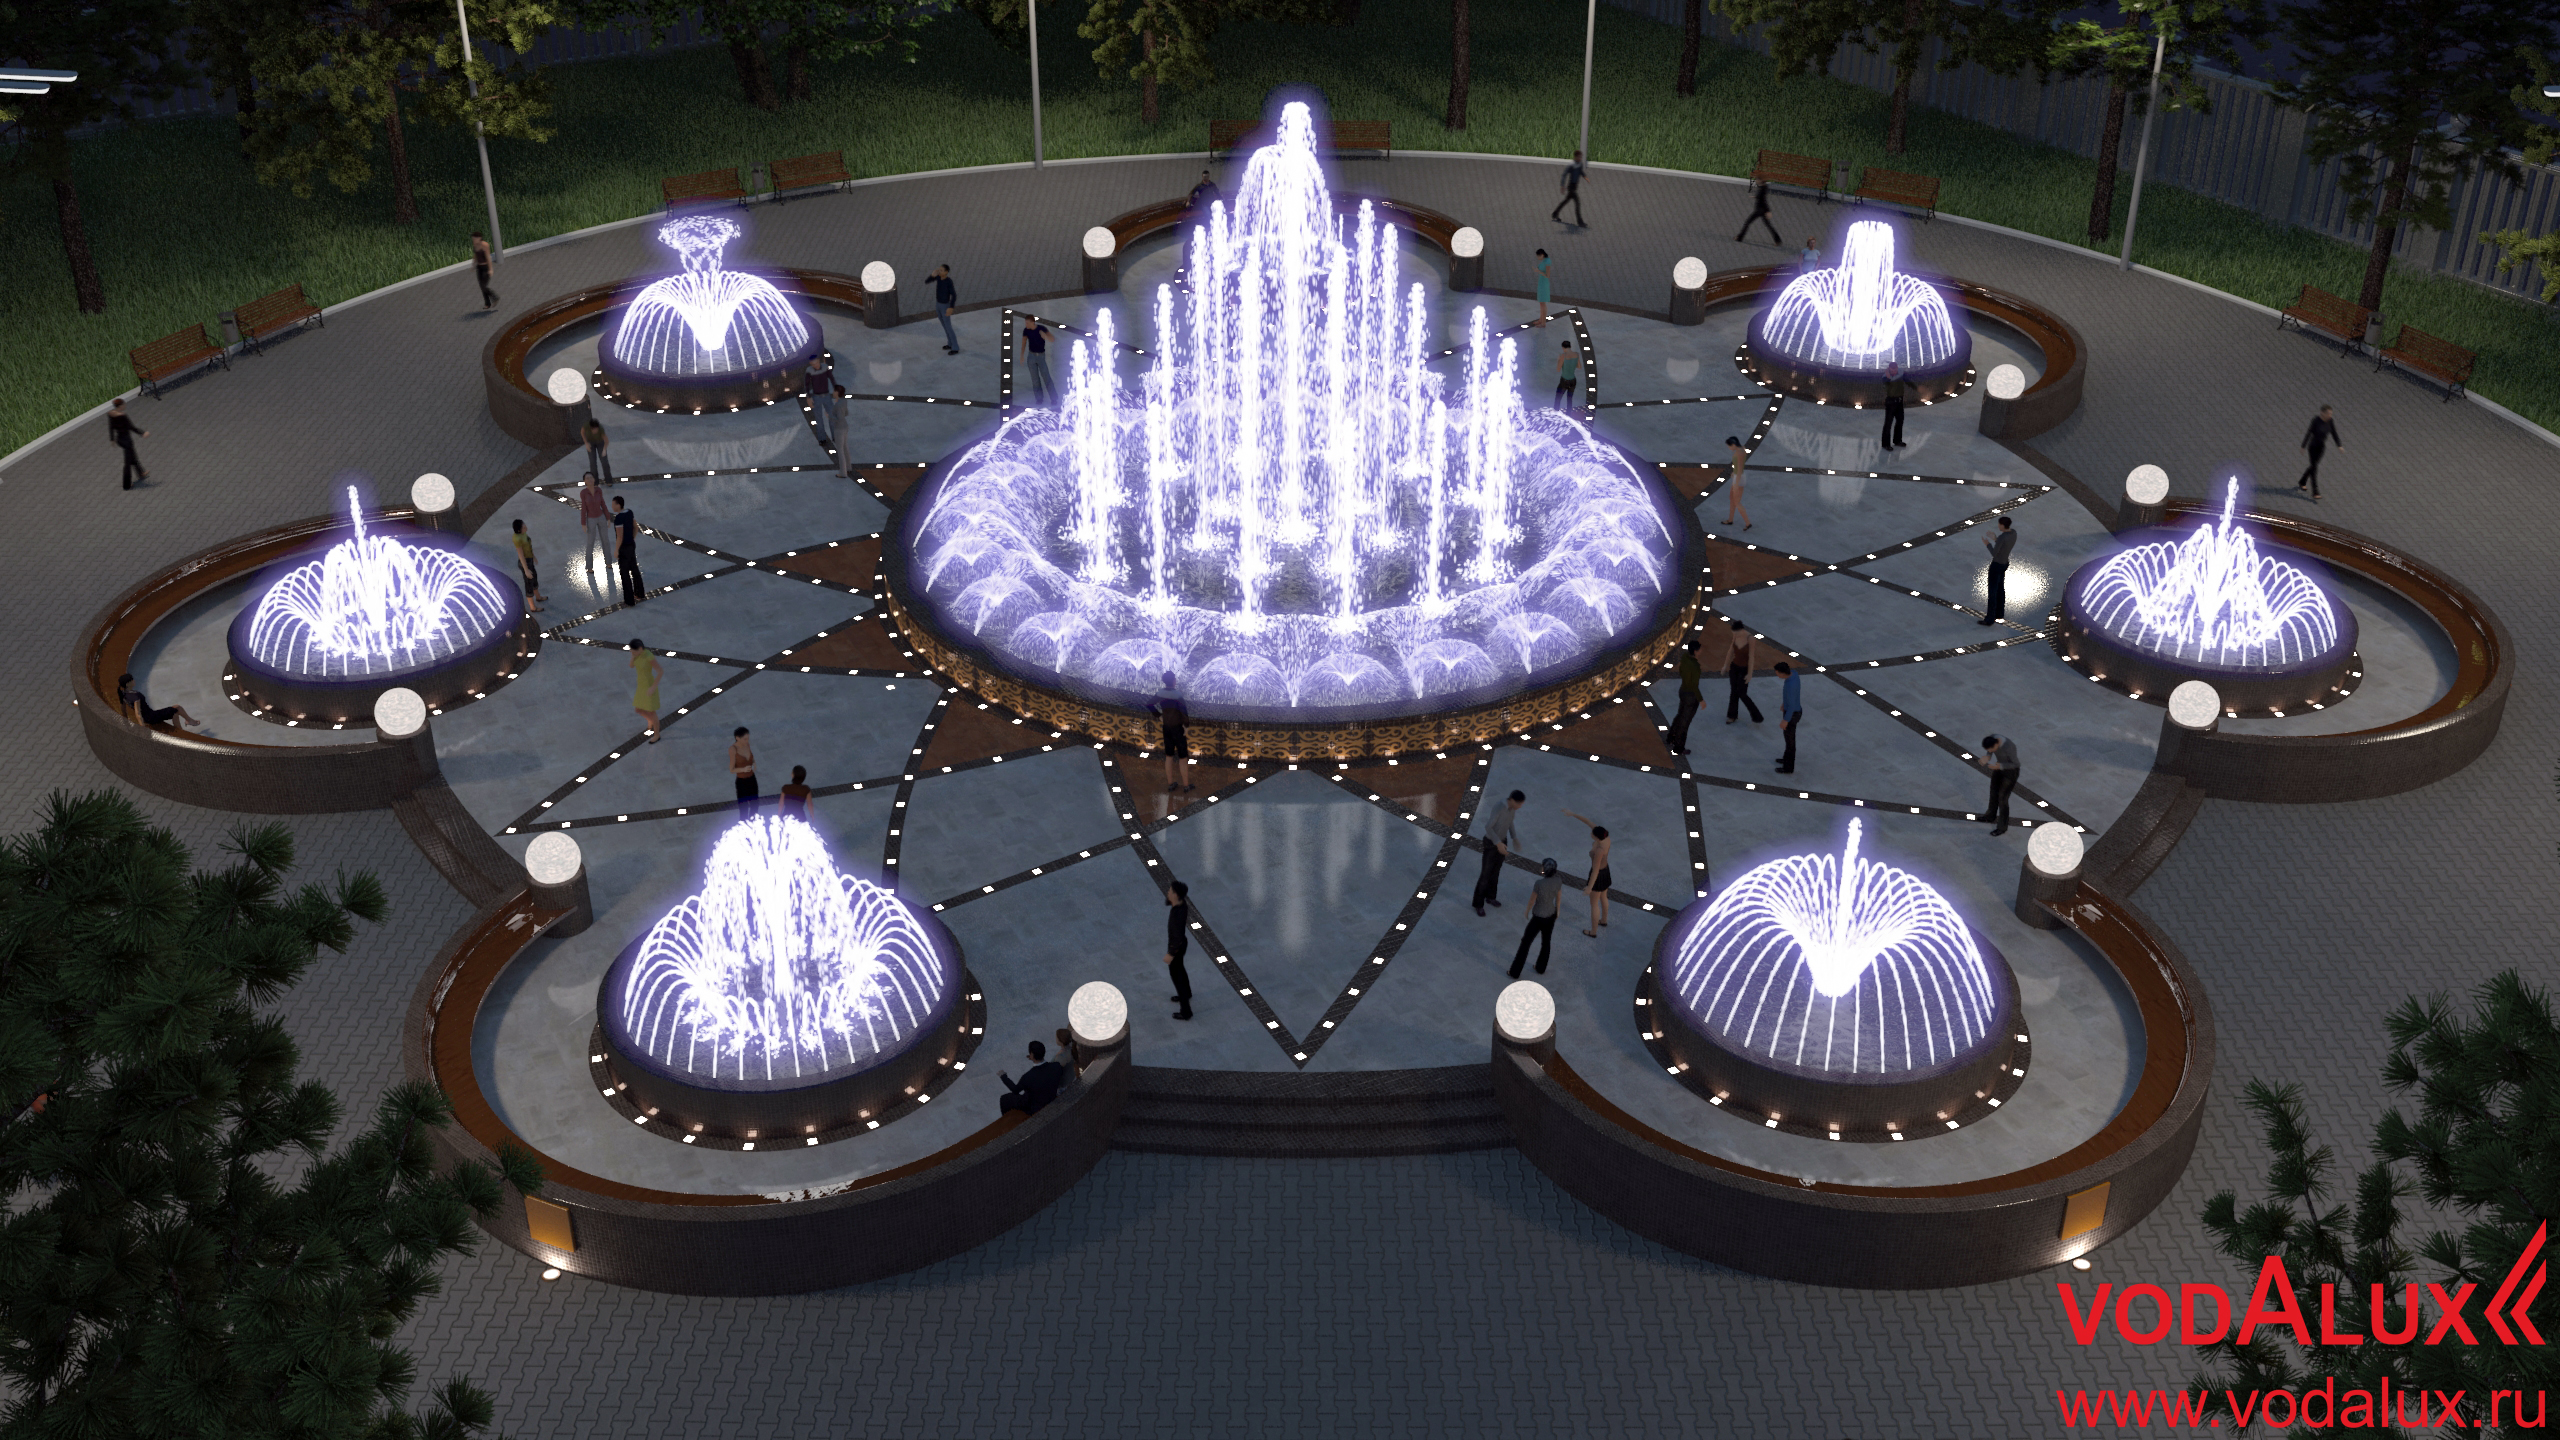 фонтан картинка с размерами мягких